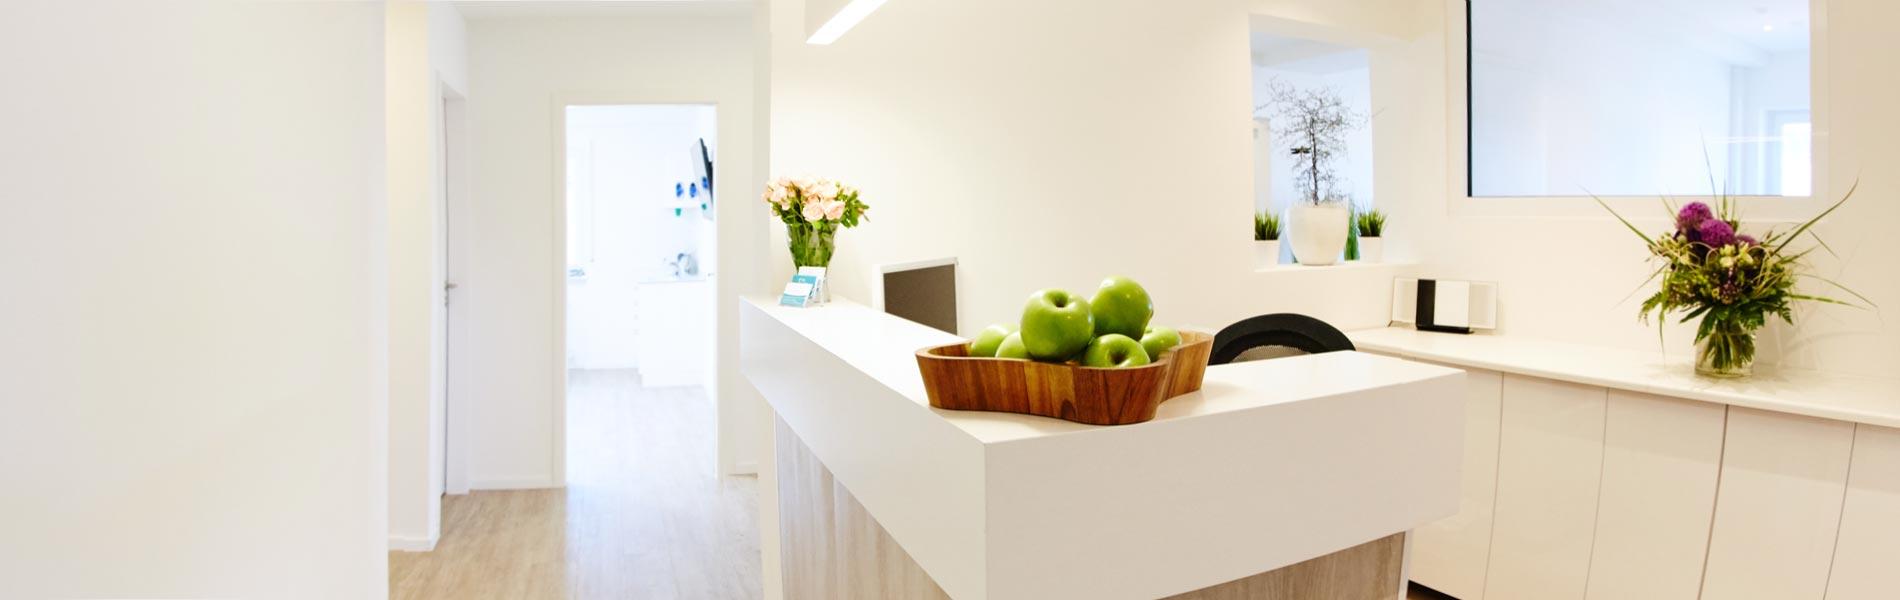 Zahnarztpraxis Dr. Sonja Goupil - Bayrisch / Bairisch 1